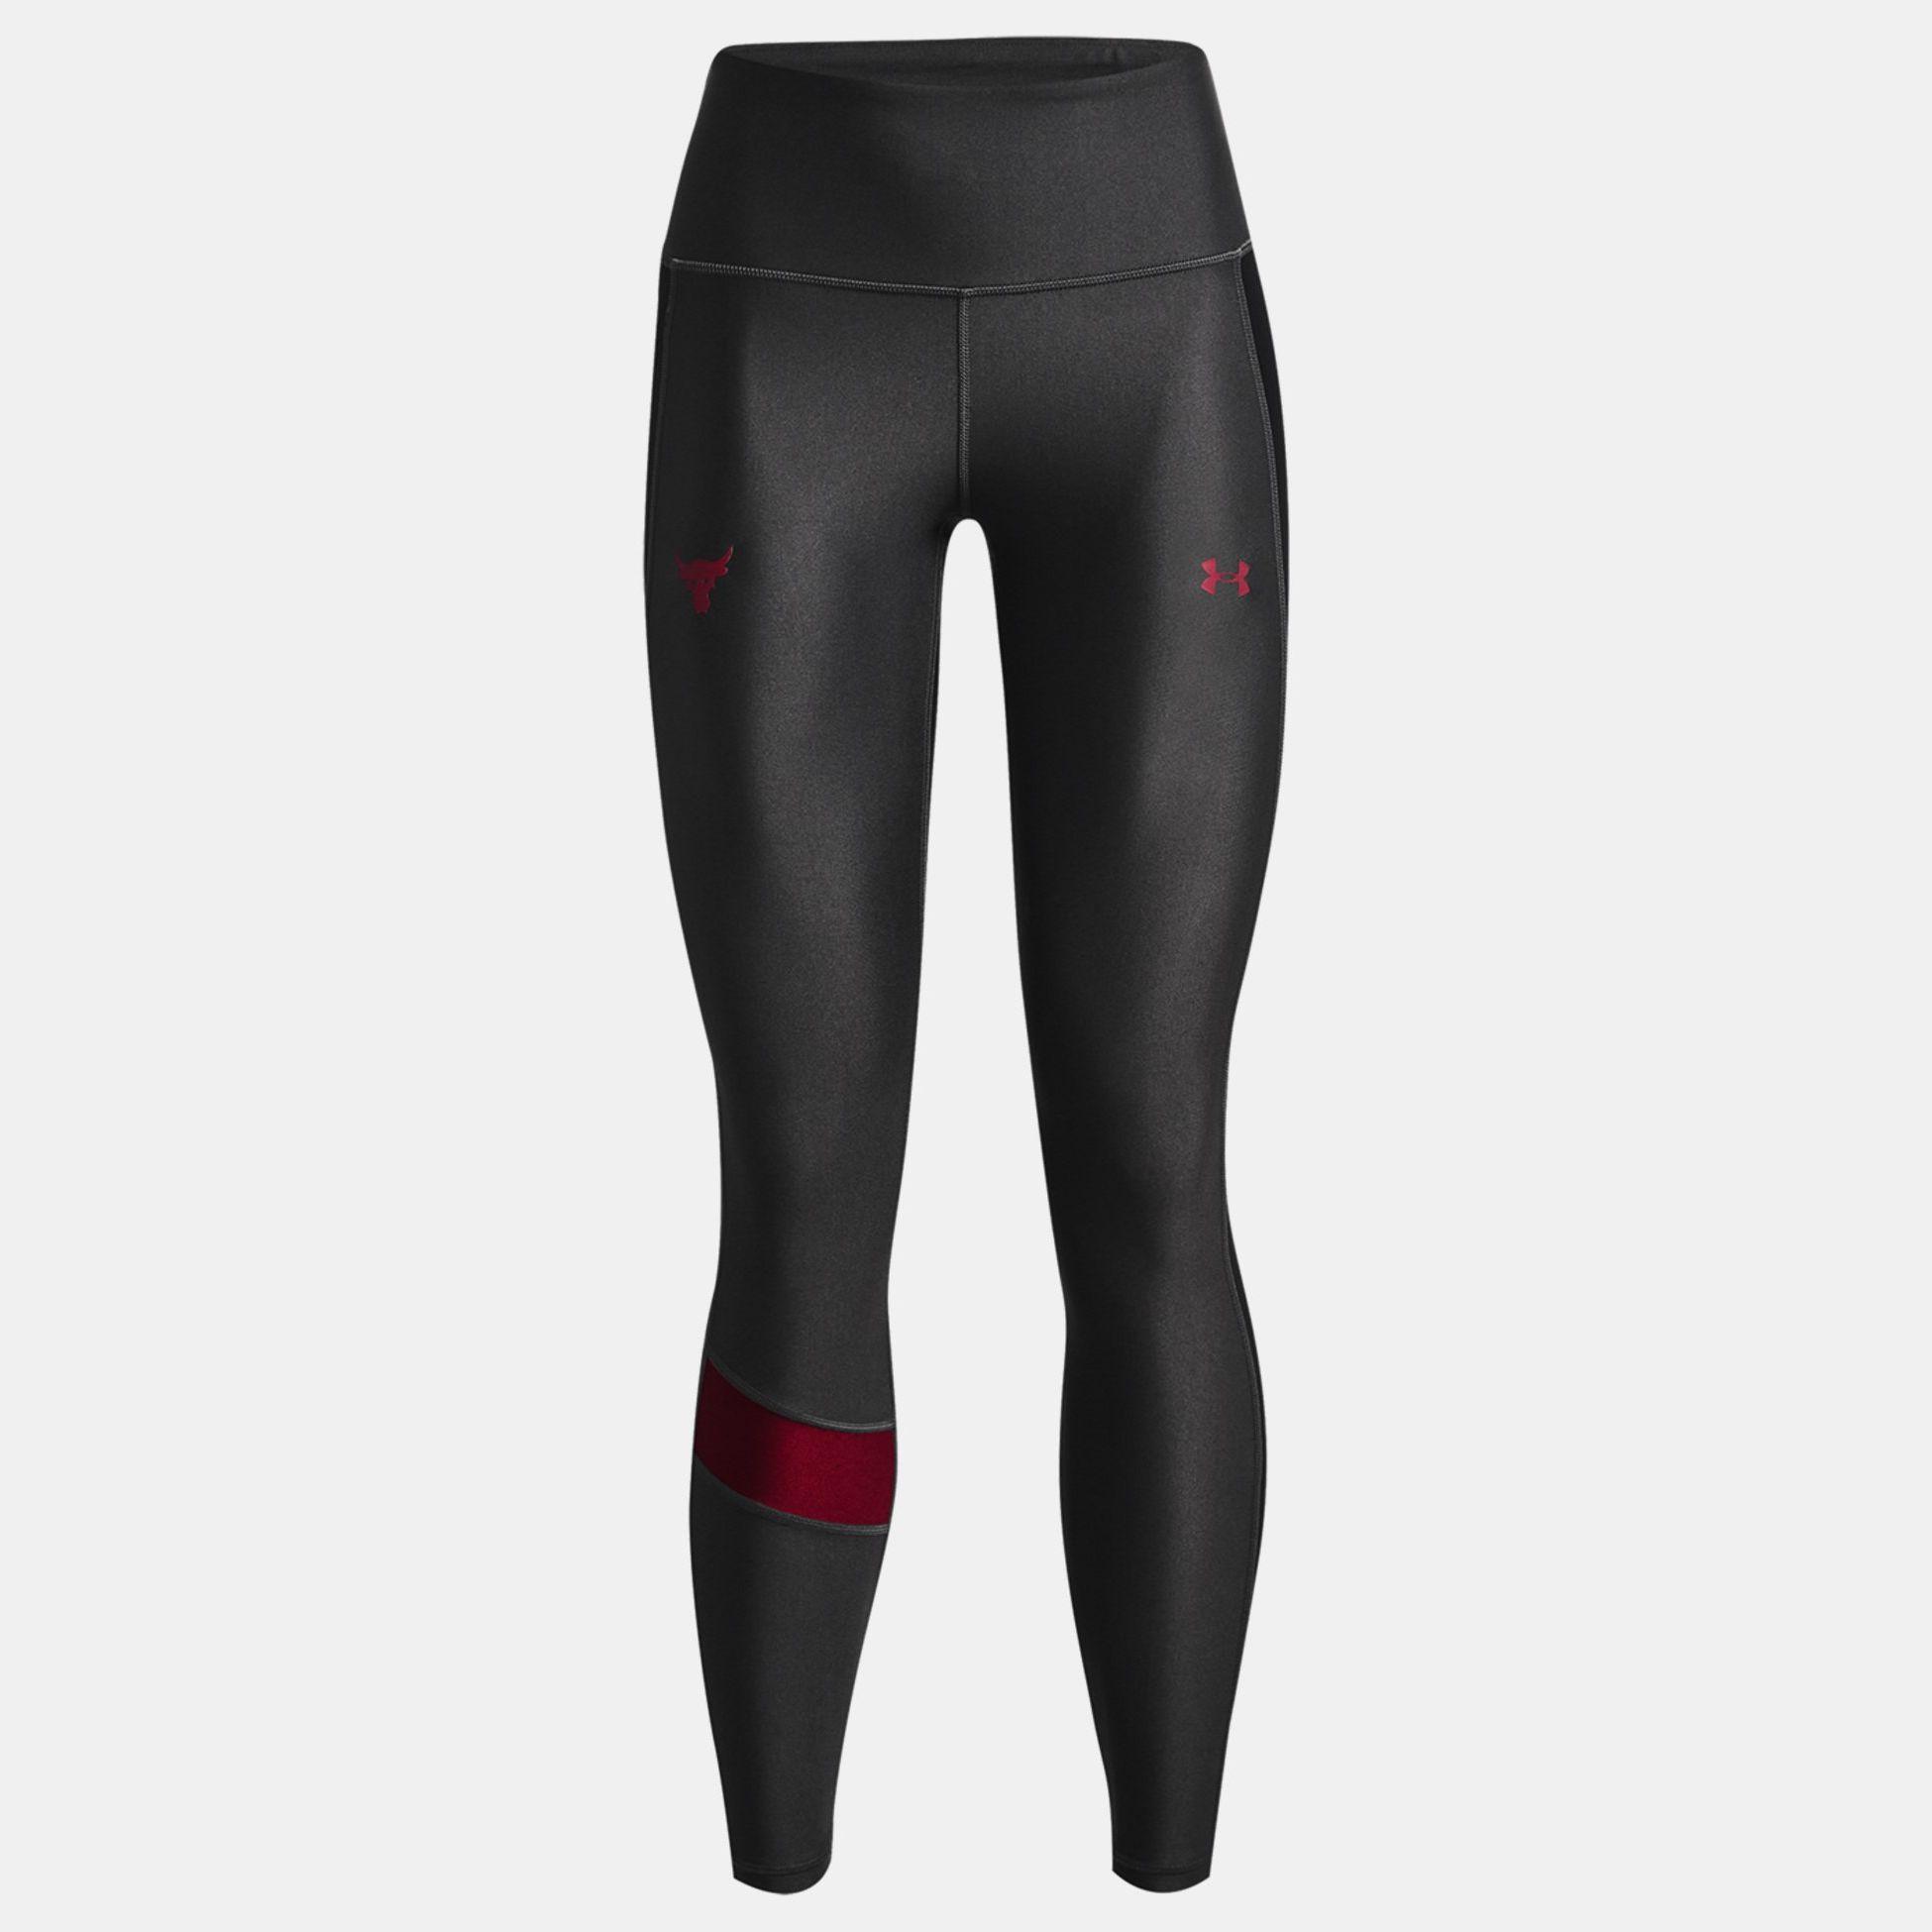 Clothing -  under armour Project Rock HeatGear No-Slip Waistband Leggings